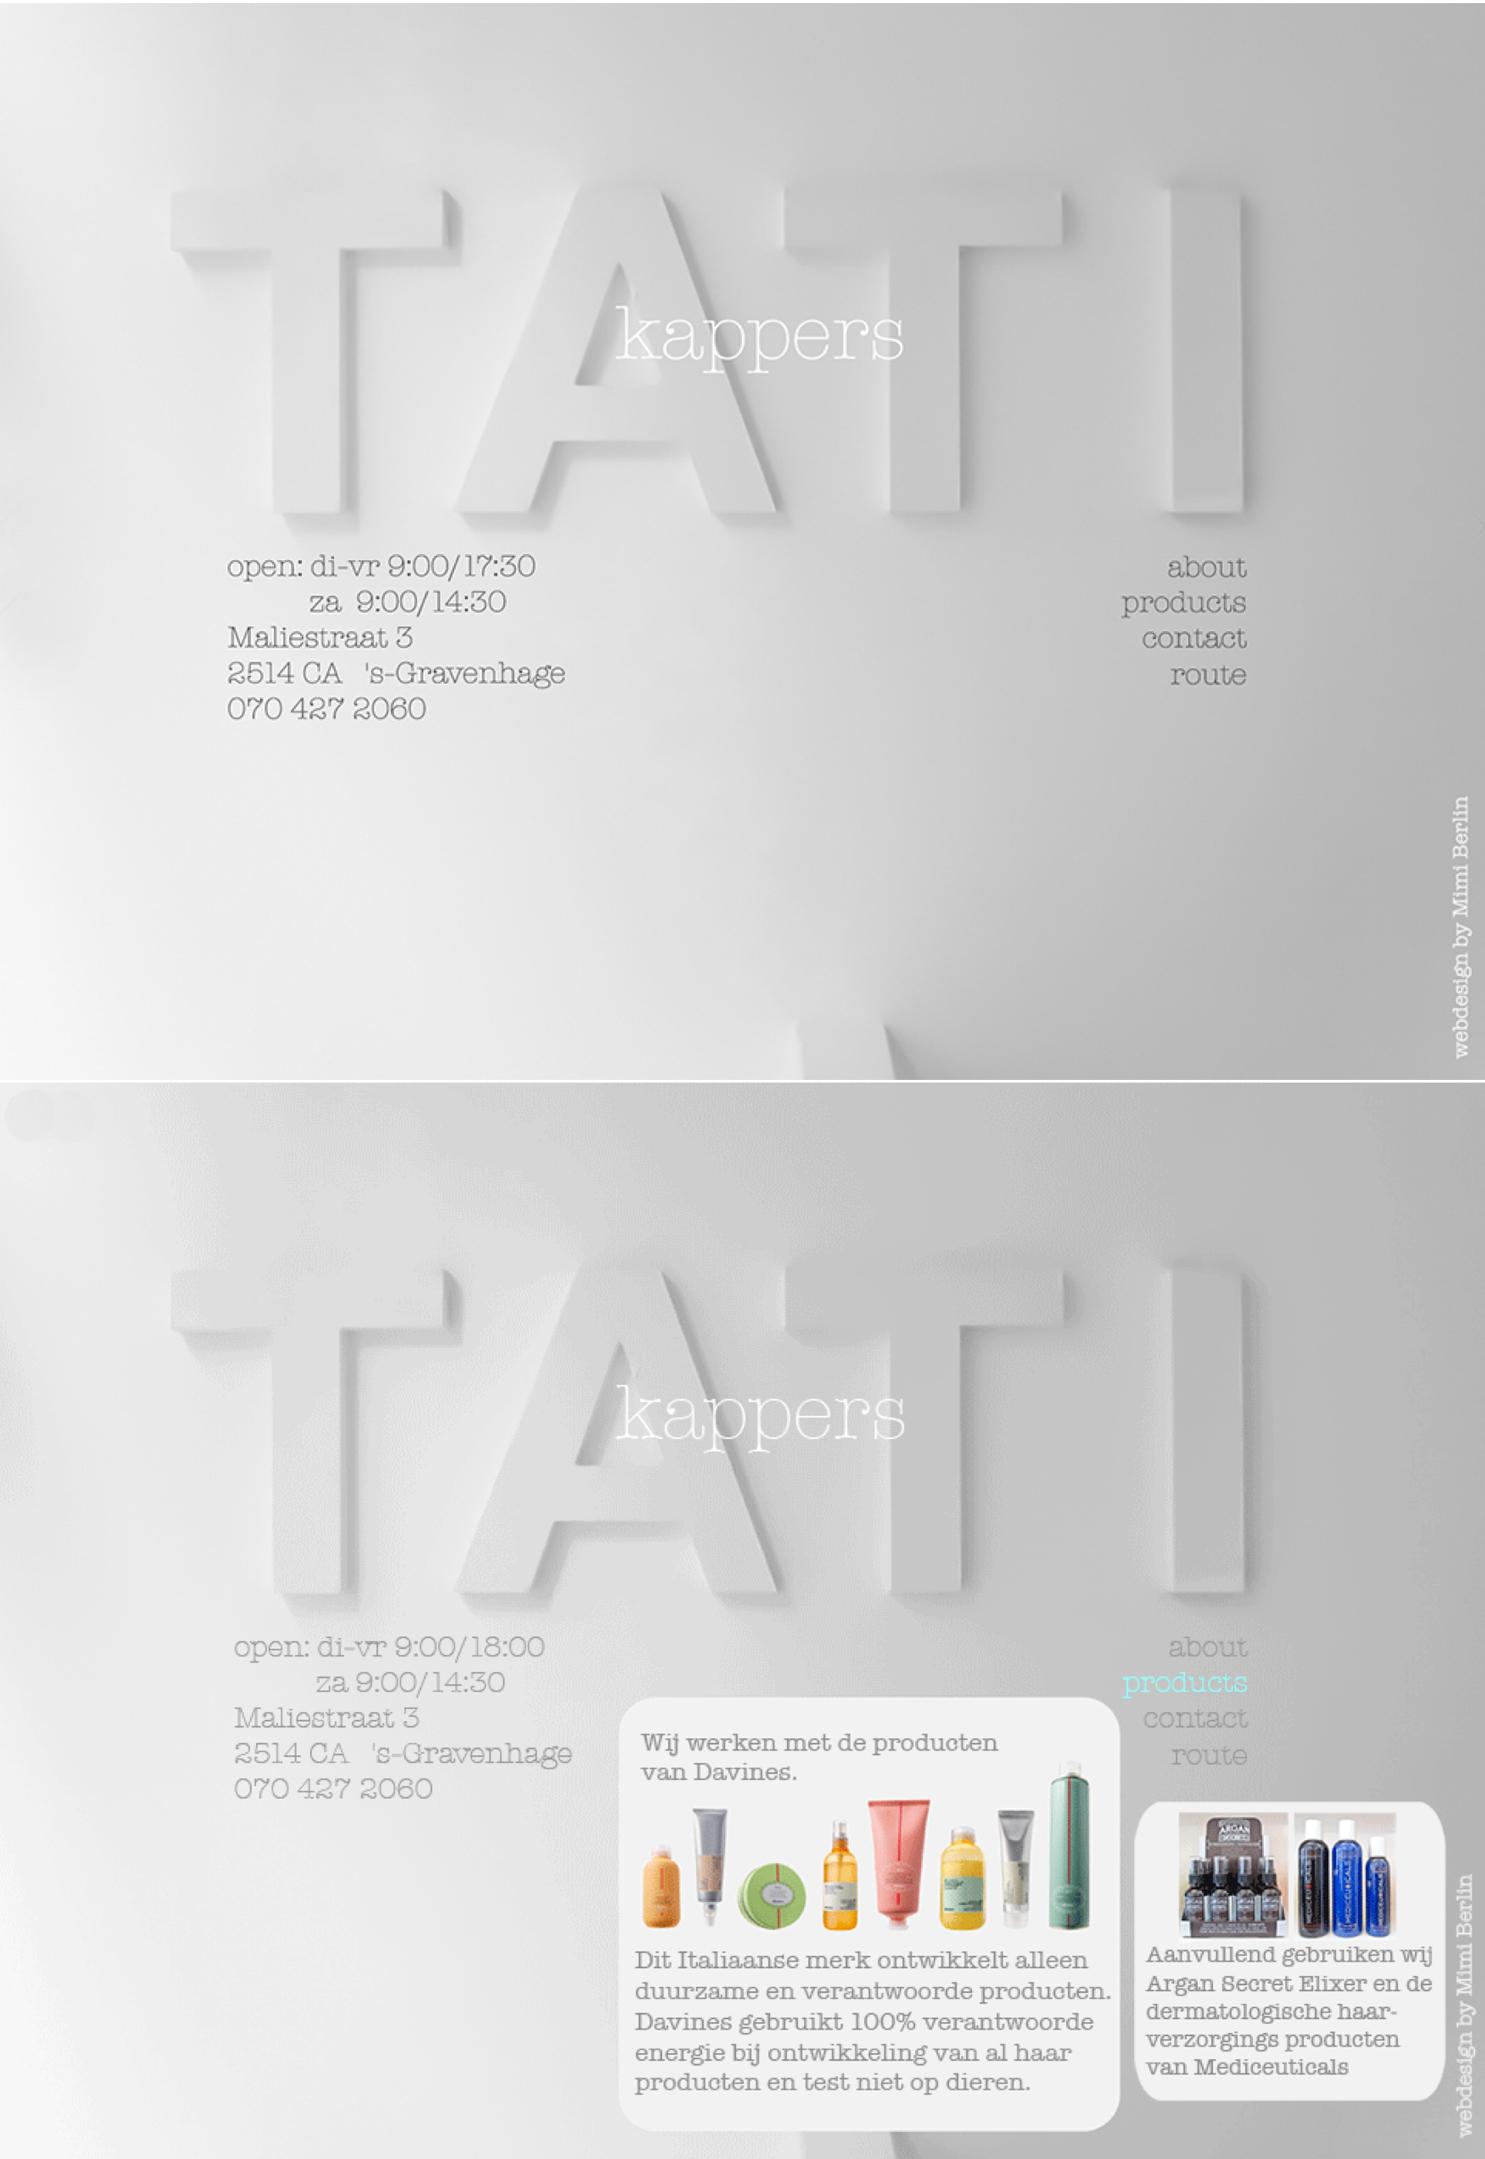 Website Design by Appdikted @Mimi Berlin for Tati Kappers